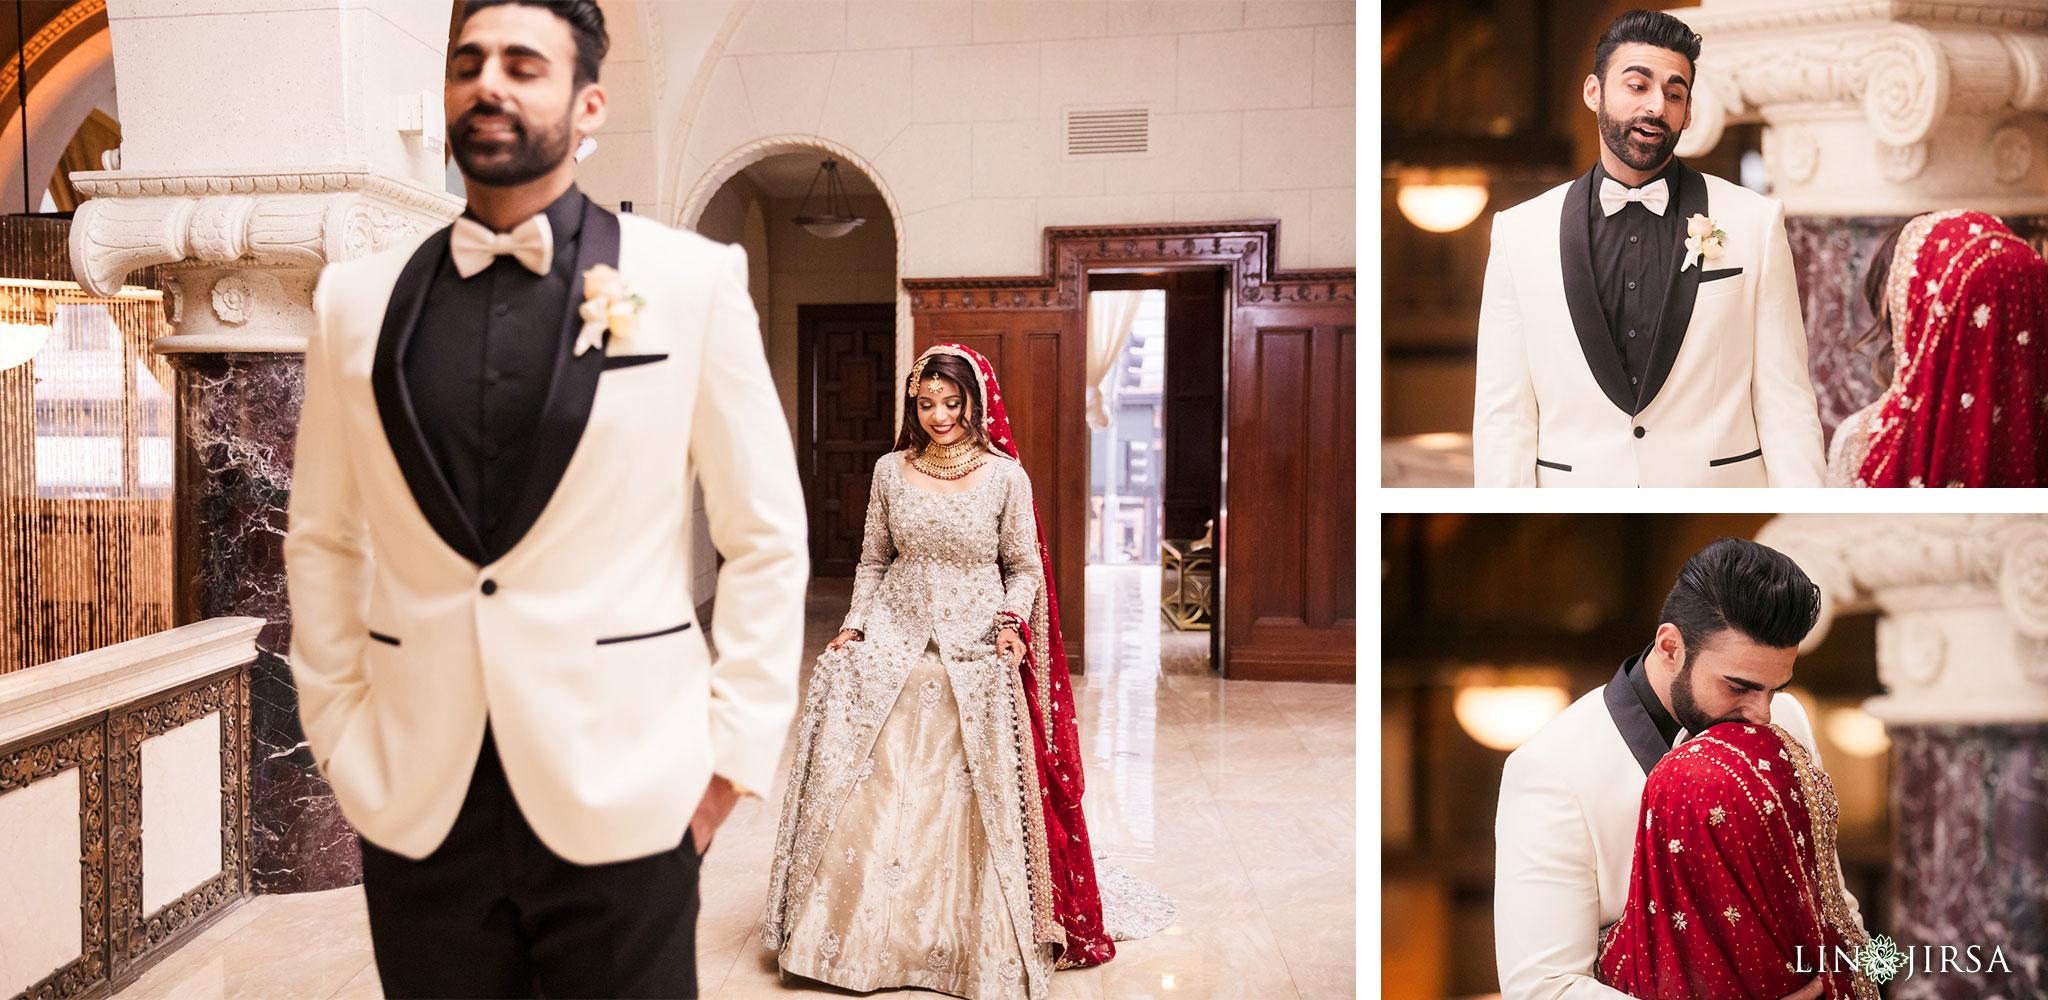 07 Majestic Downtown Los Angeles Pakistani Muslim Wedding Photography